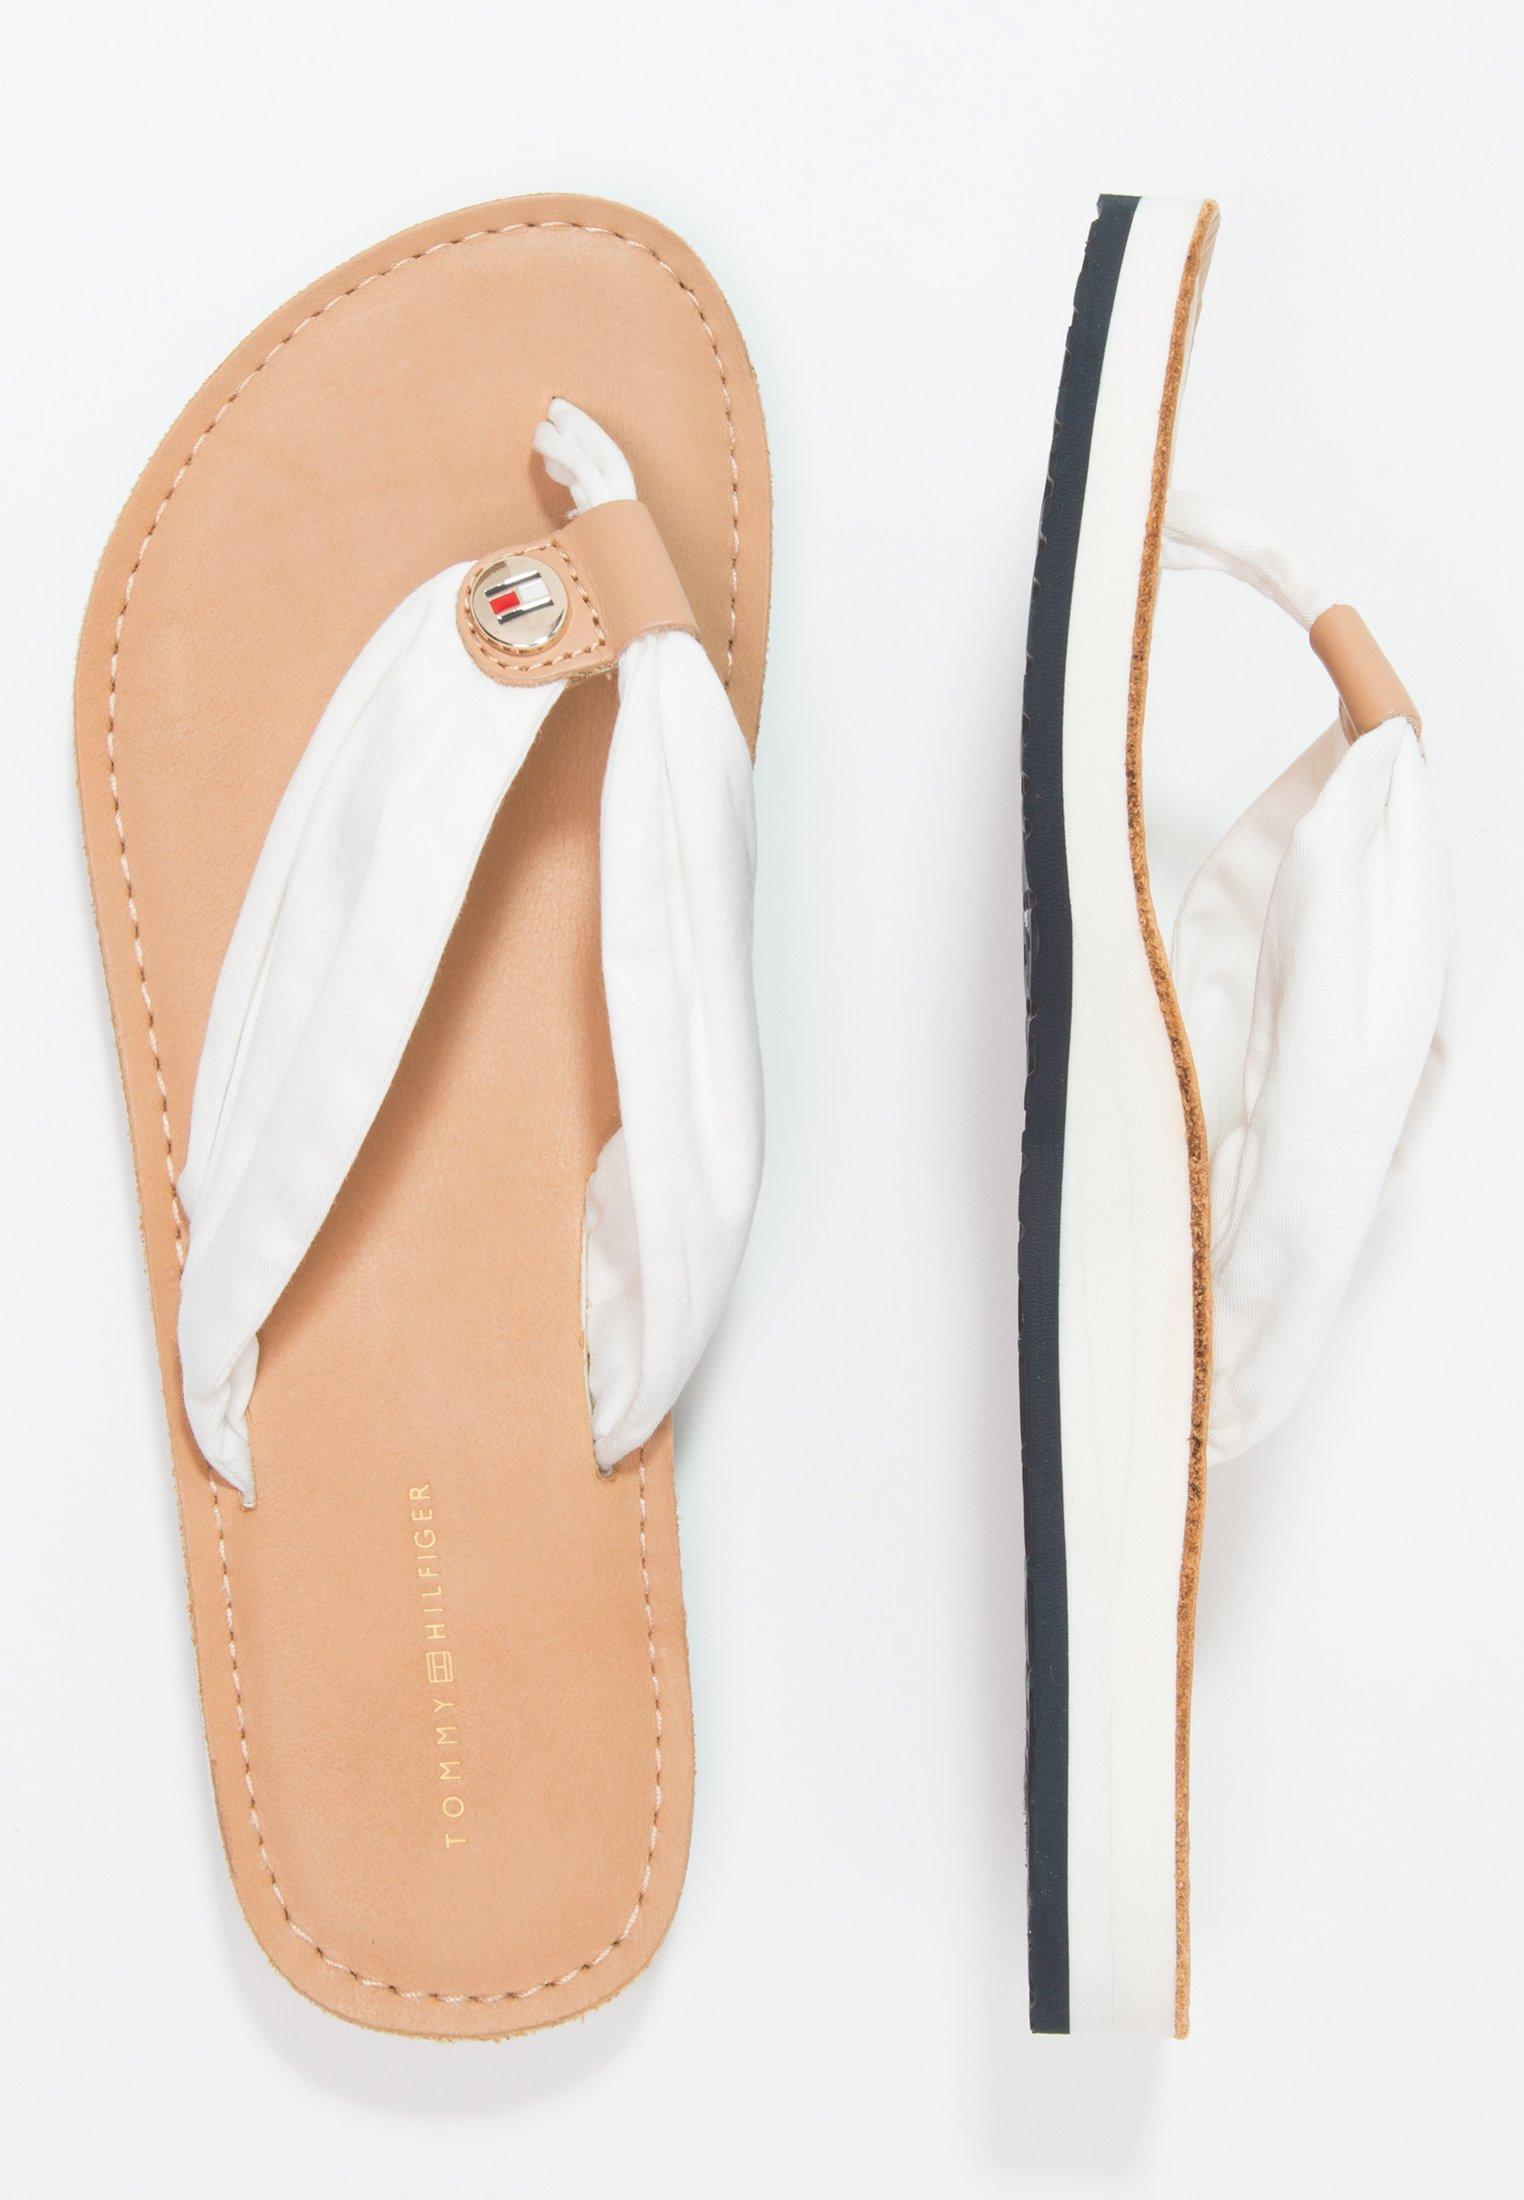 Tommy Hilfiger LEATHER FOOTBED BEACH SANDAL - Japonki - white